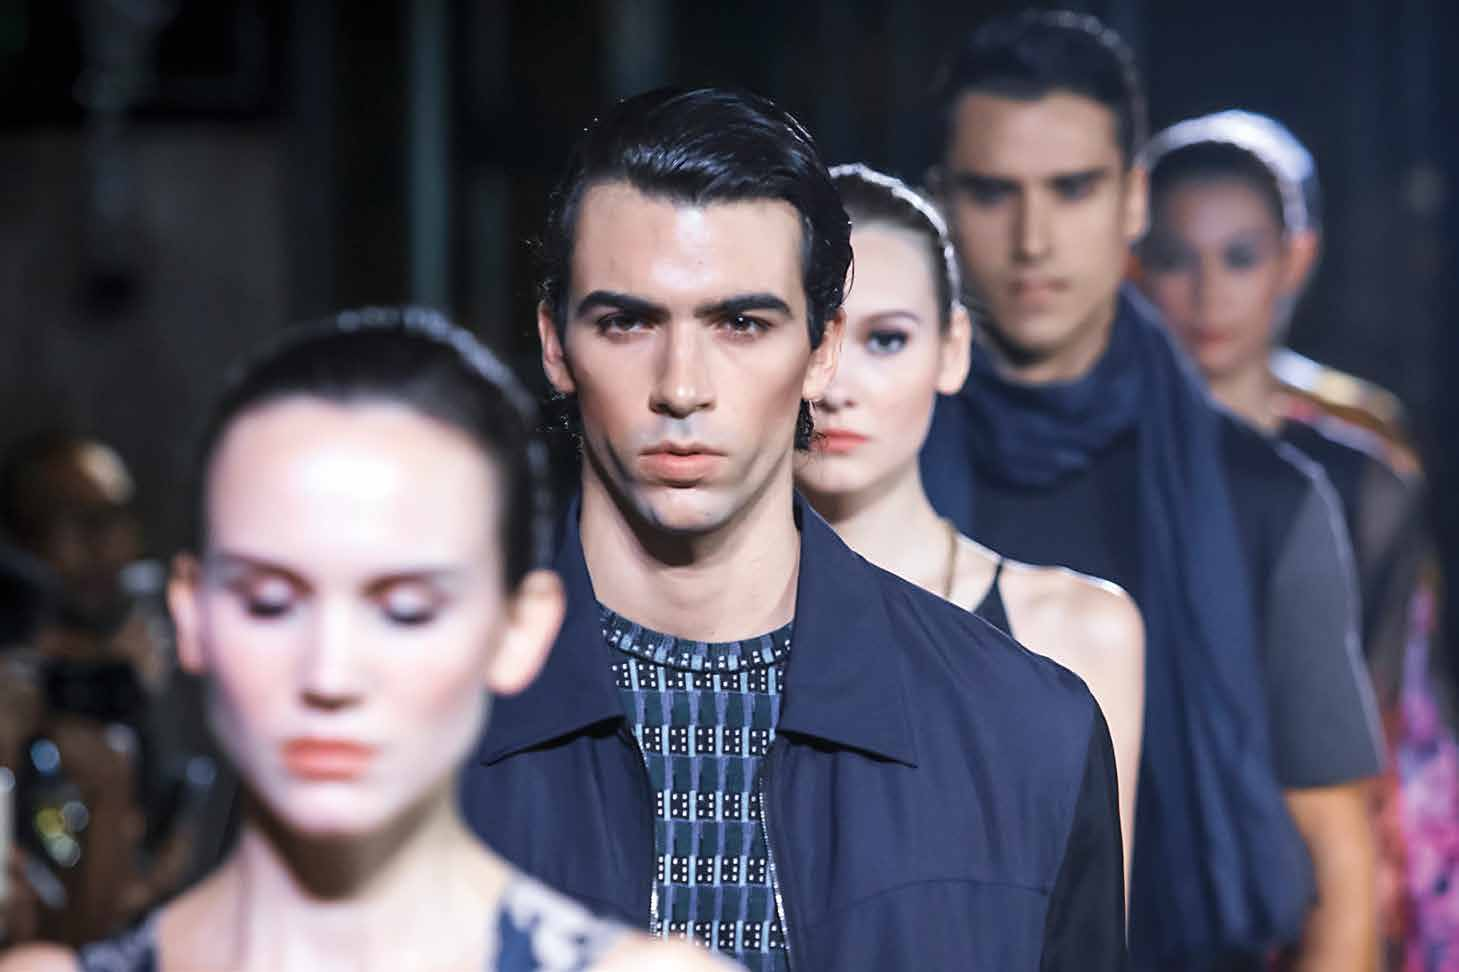 Lanvin Models on The Catwalk